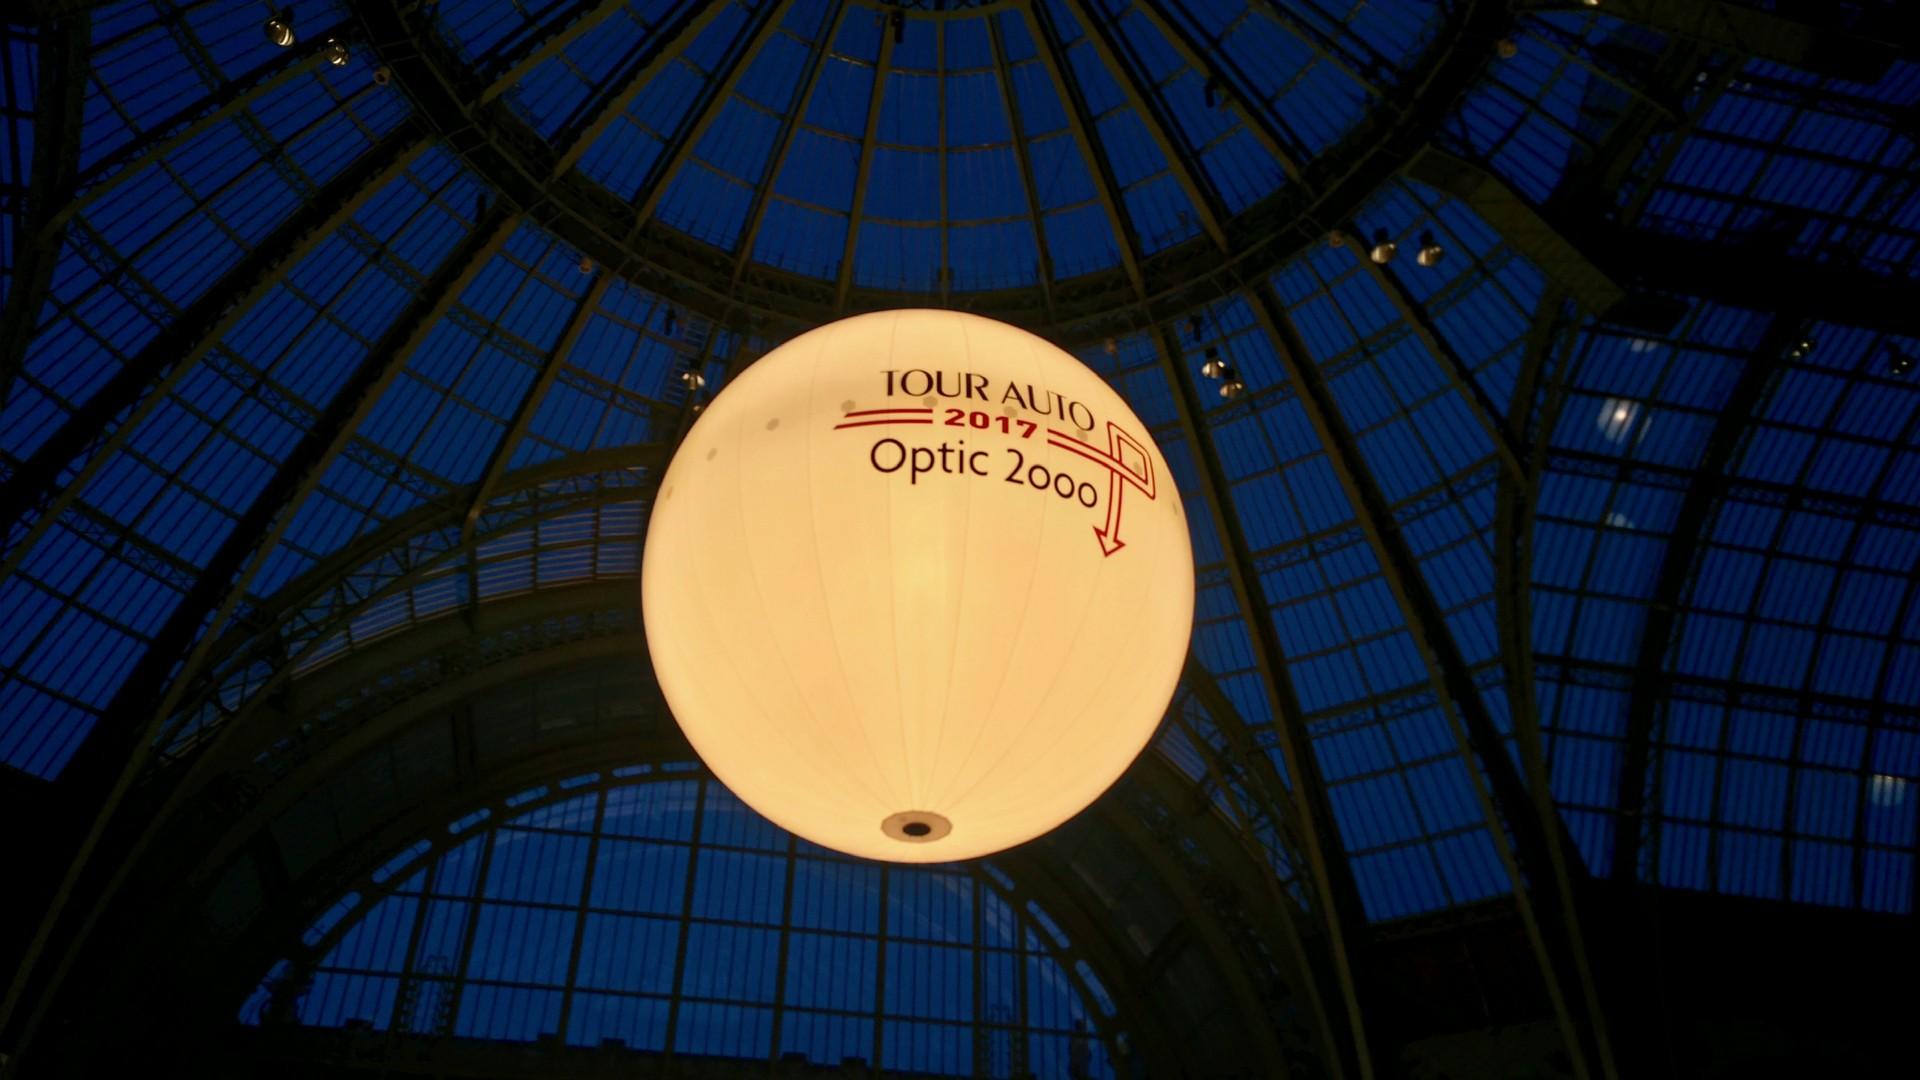 Tour Auto 2017 в Grand Palais, комната для  элегантность